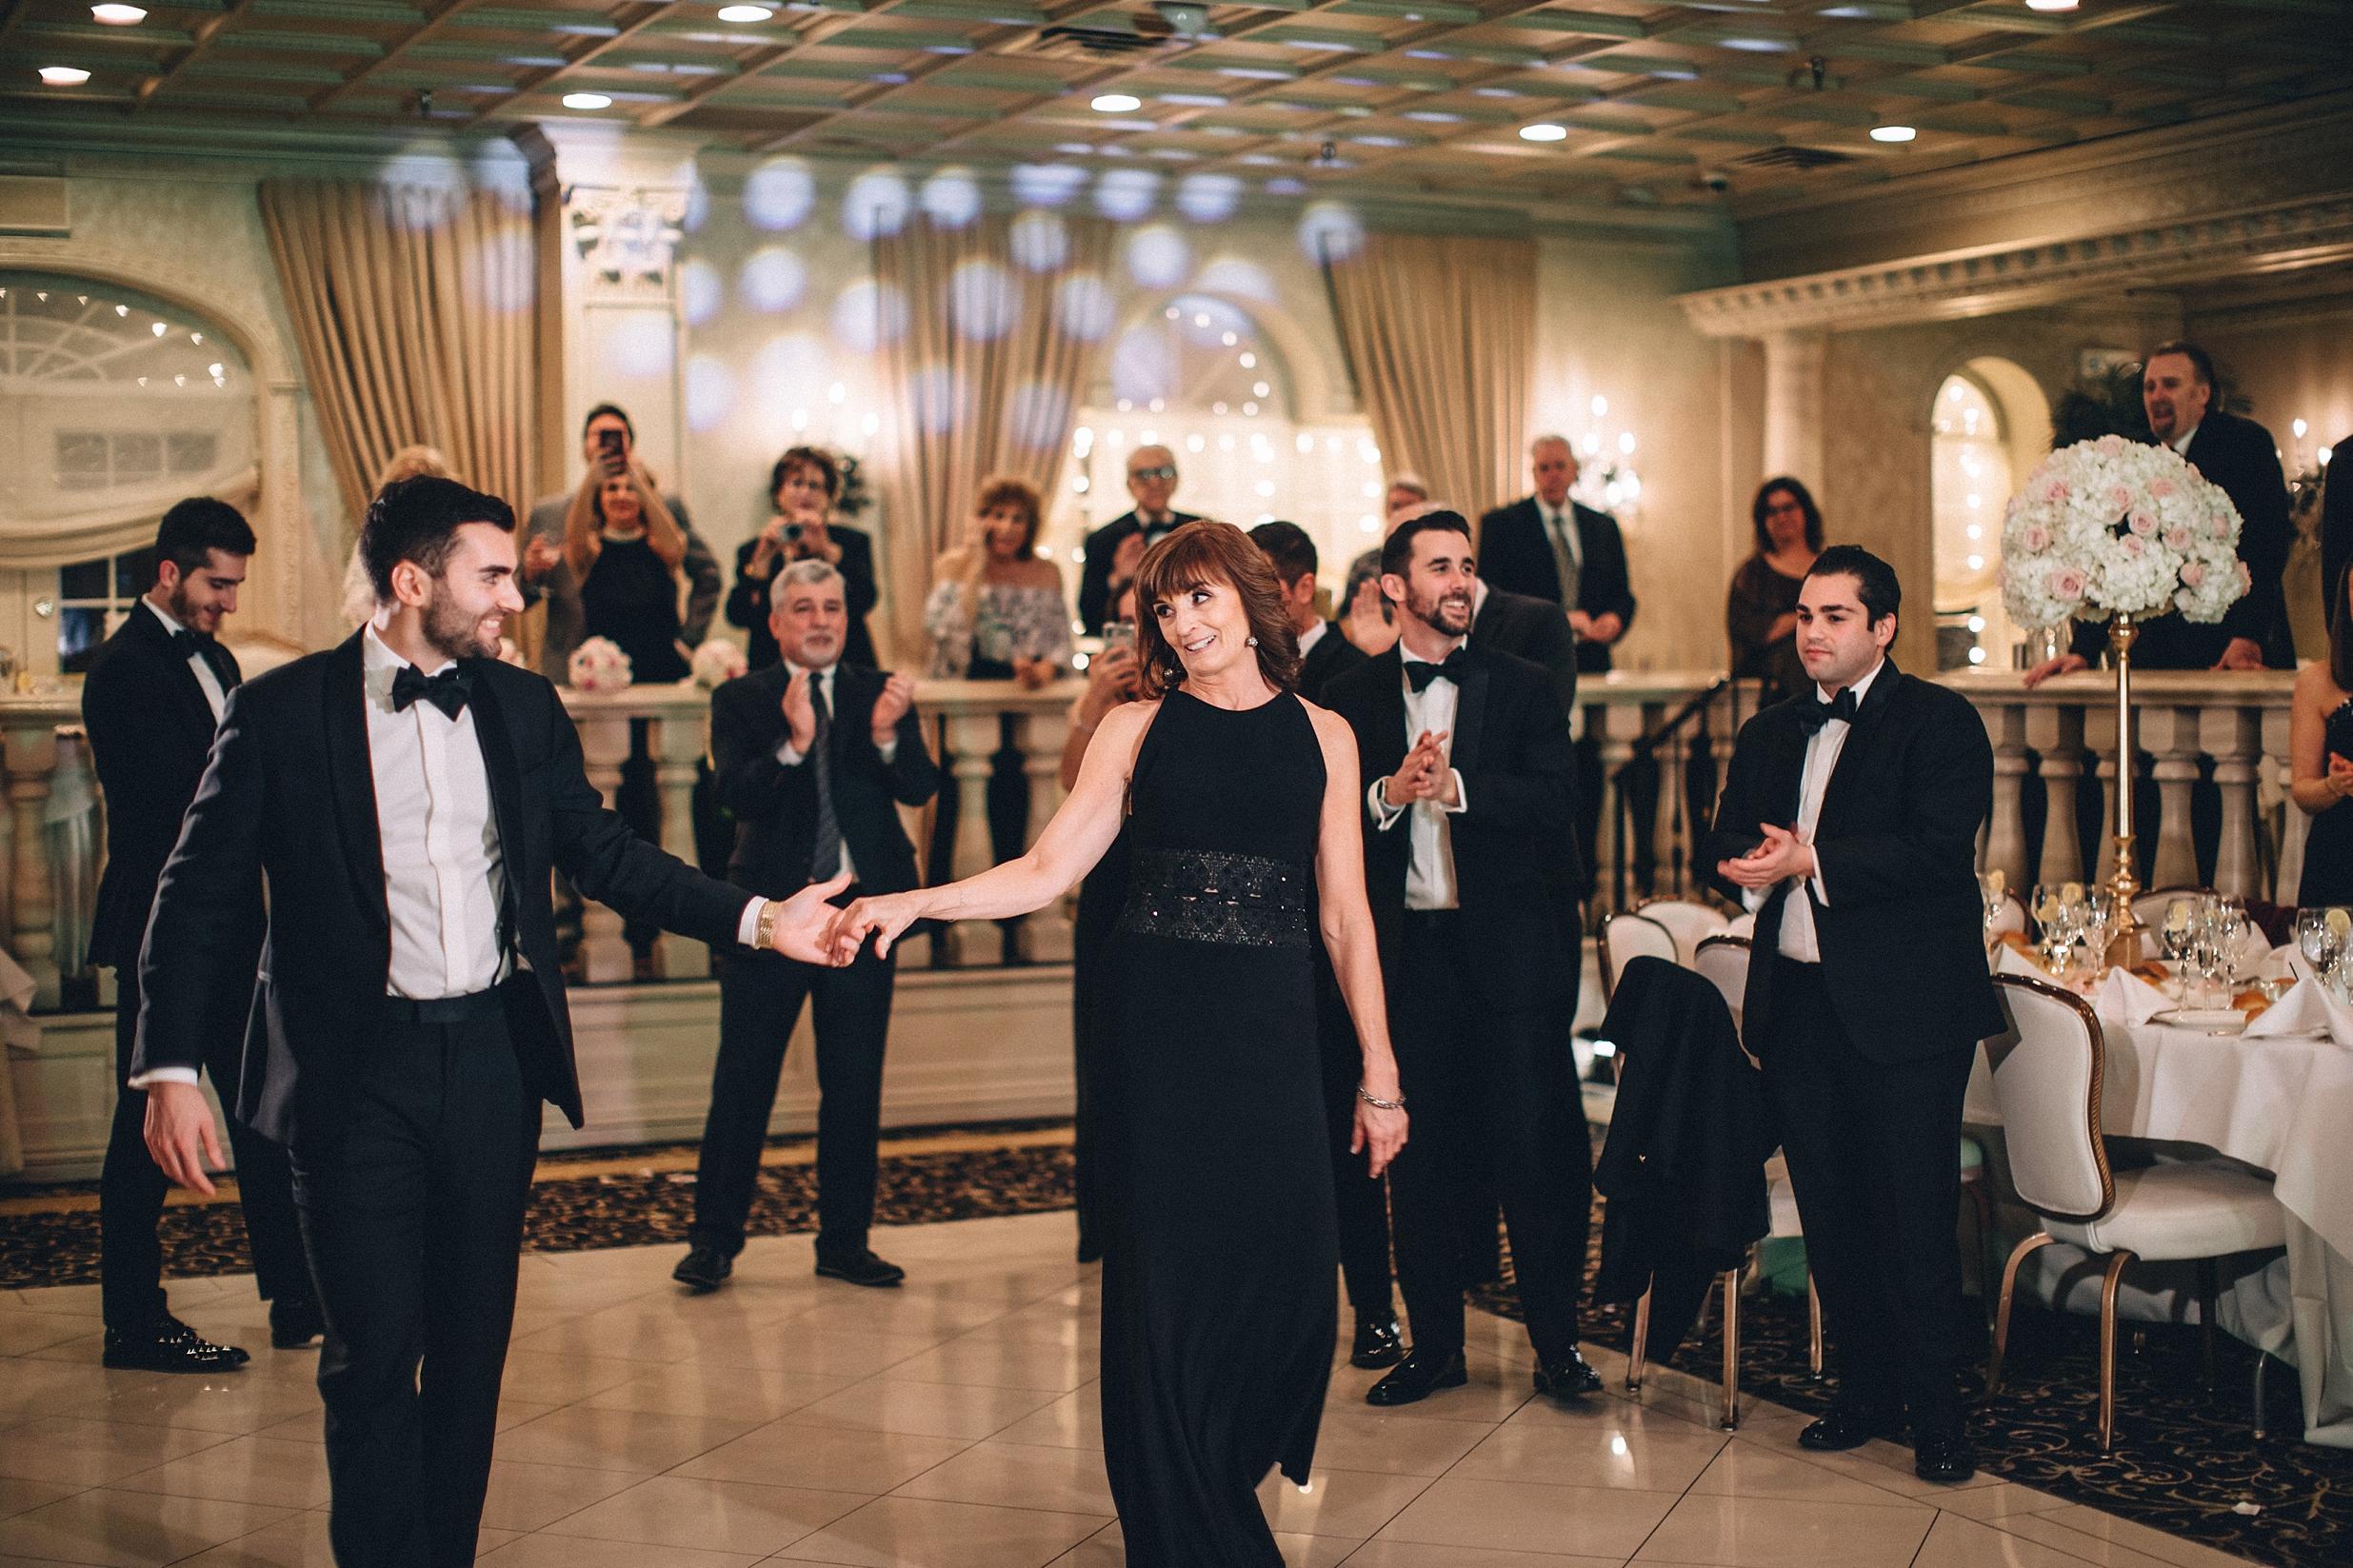 winter-wedding-snow-indoor-ceremony-nj-photographer_0040.jpg